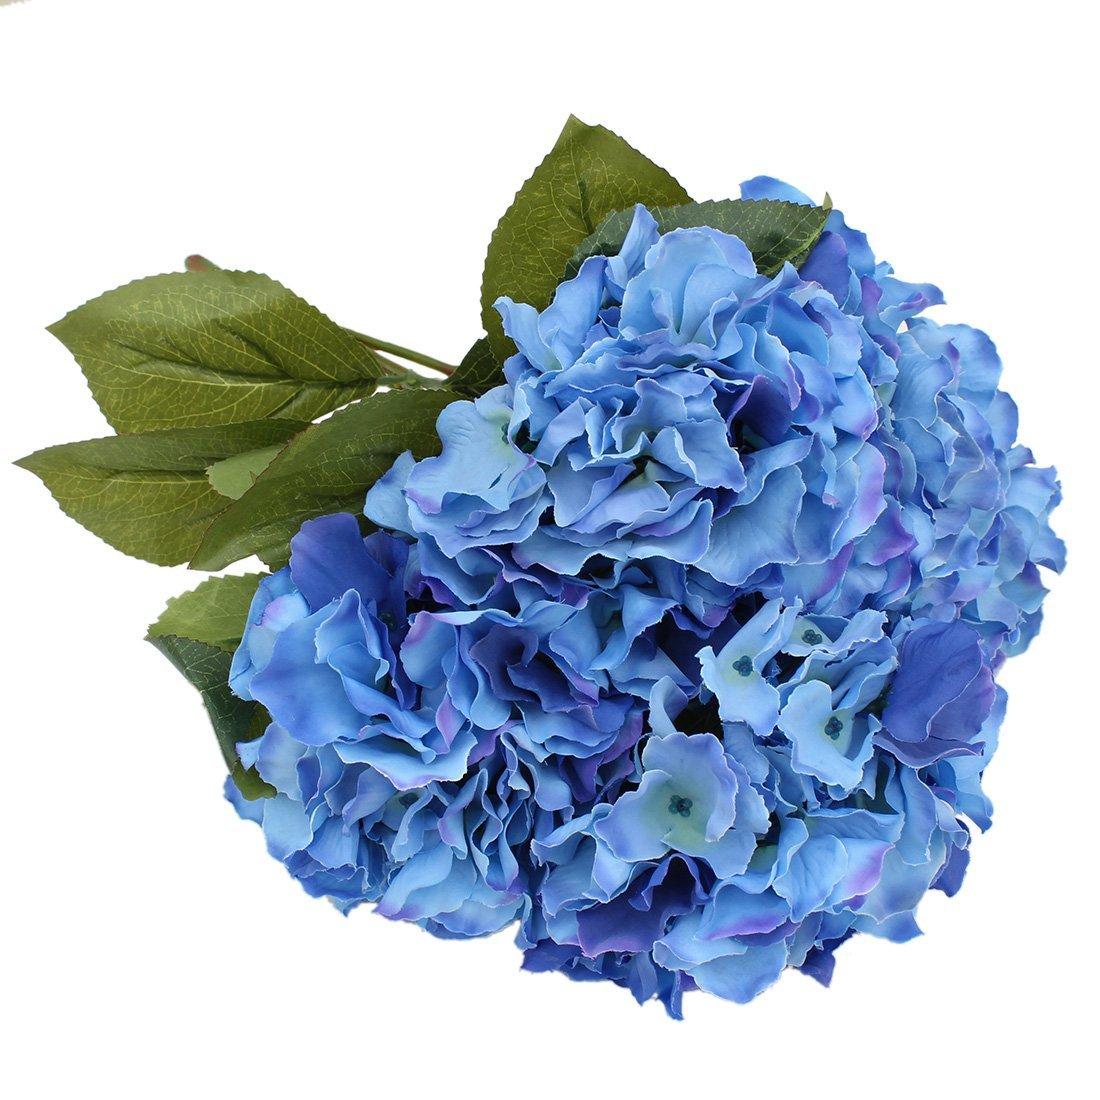 Blue silk flowers for wedding amazon luyue 5 big heads artificial silk hydrangeas bouquet fake flowers arrangement home wedding decor dark mightylinksfo